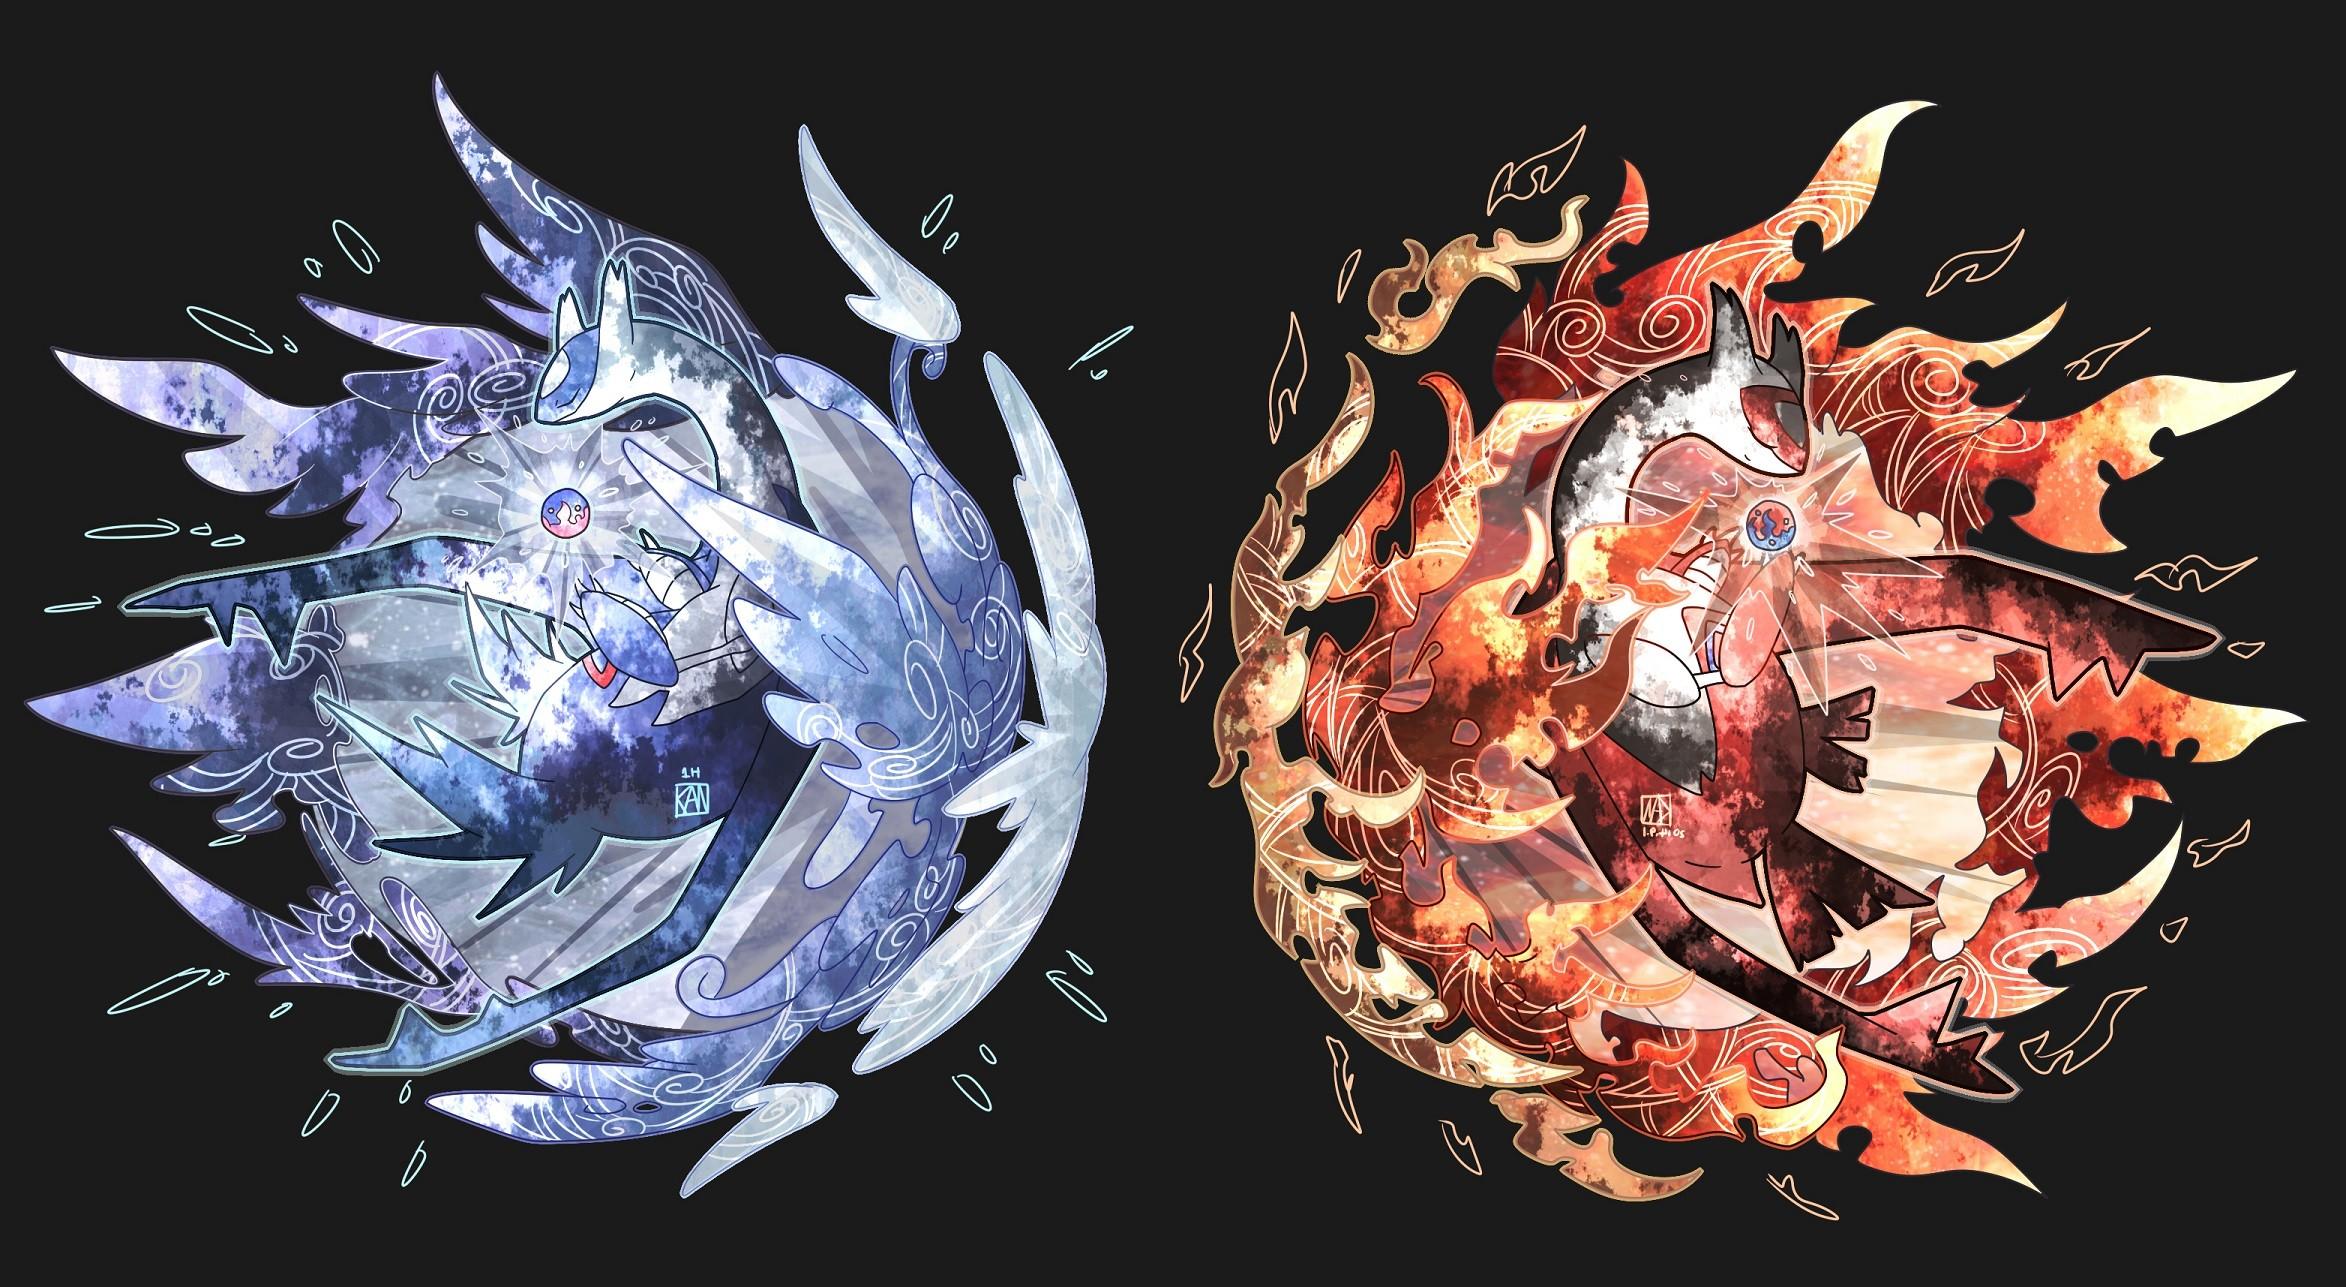 Res: 2346x1287, Video Game - Pokémon Latios (Pokémon) Latias (Pokémon) Legendary Pokémon  Wallpaper